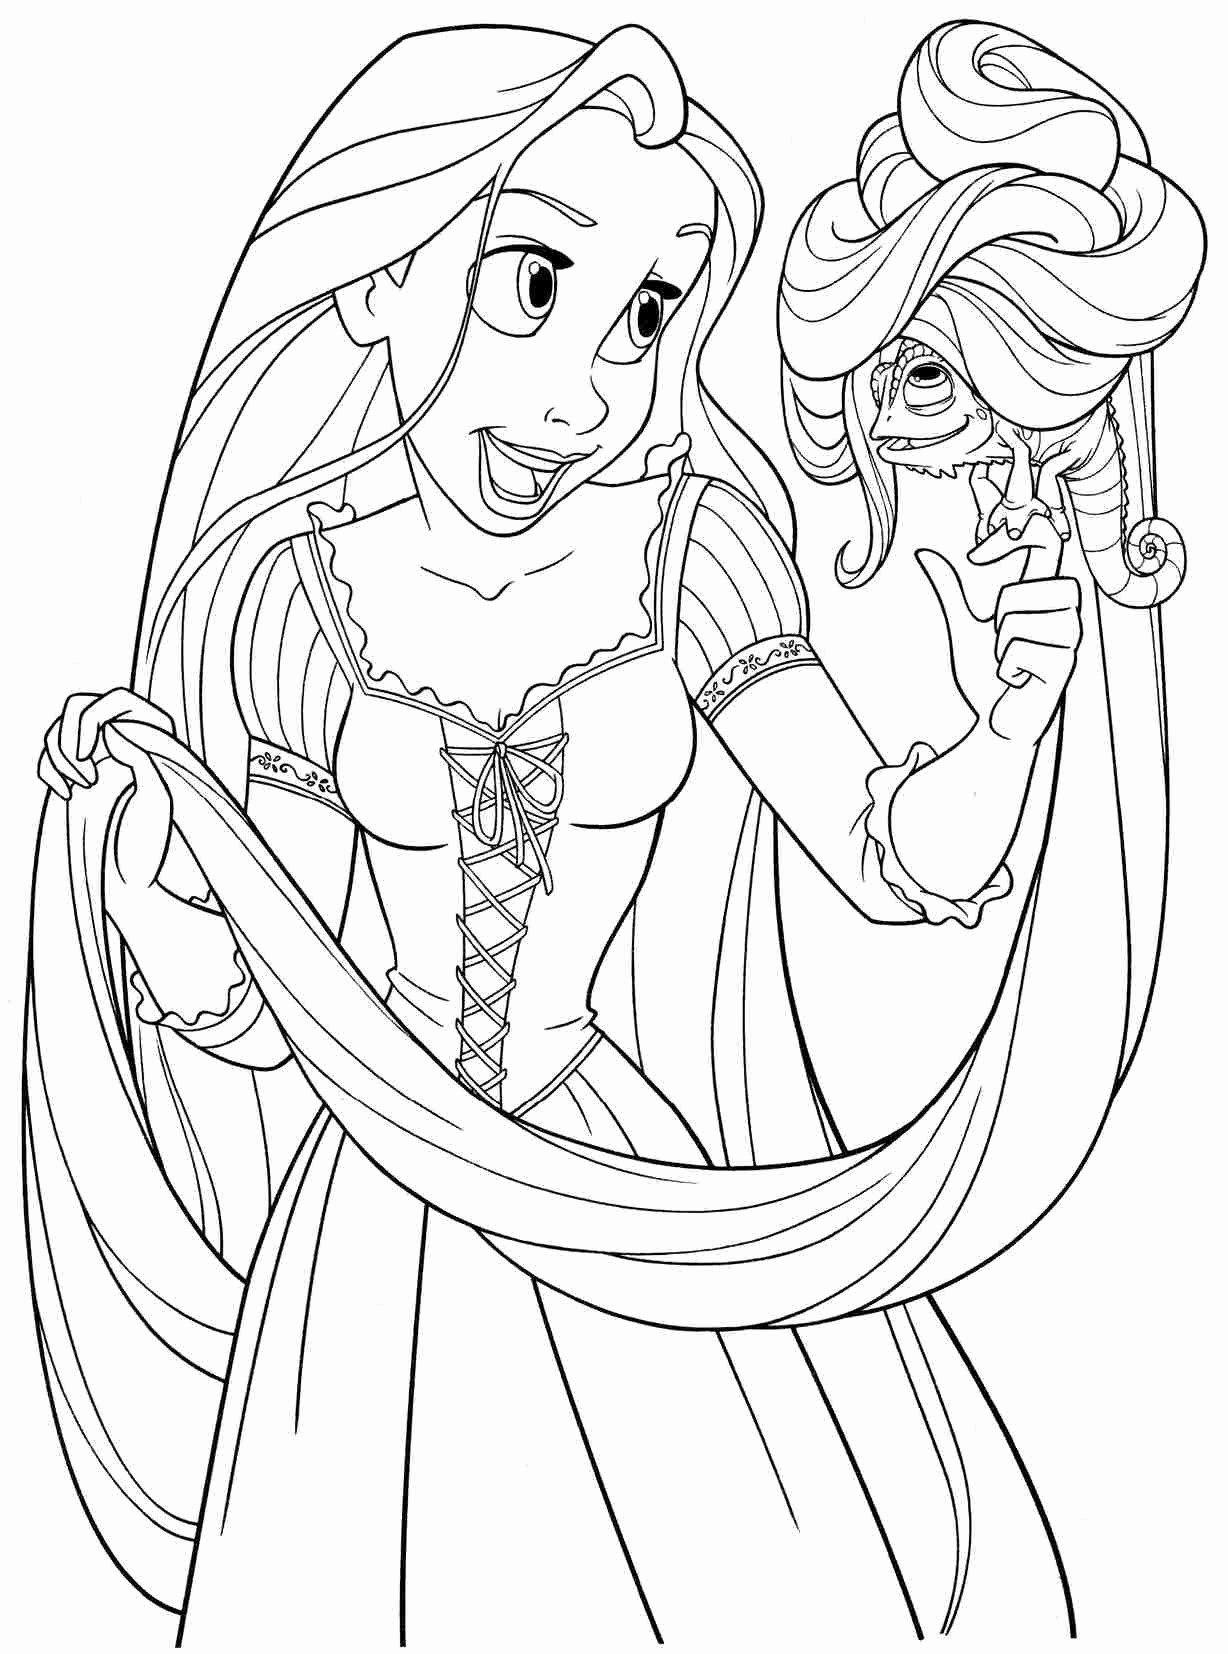 Rapunzel Disney Coloring Pages Luxury Disney Rapunzel Coloring Pages Printable Coloring Page For Rapunzel Warna Gambar